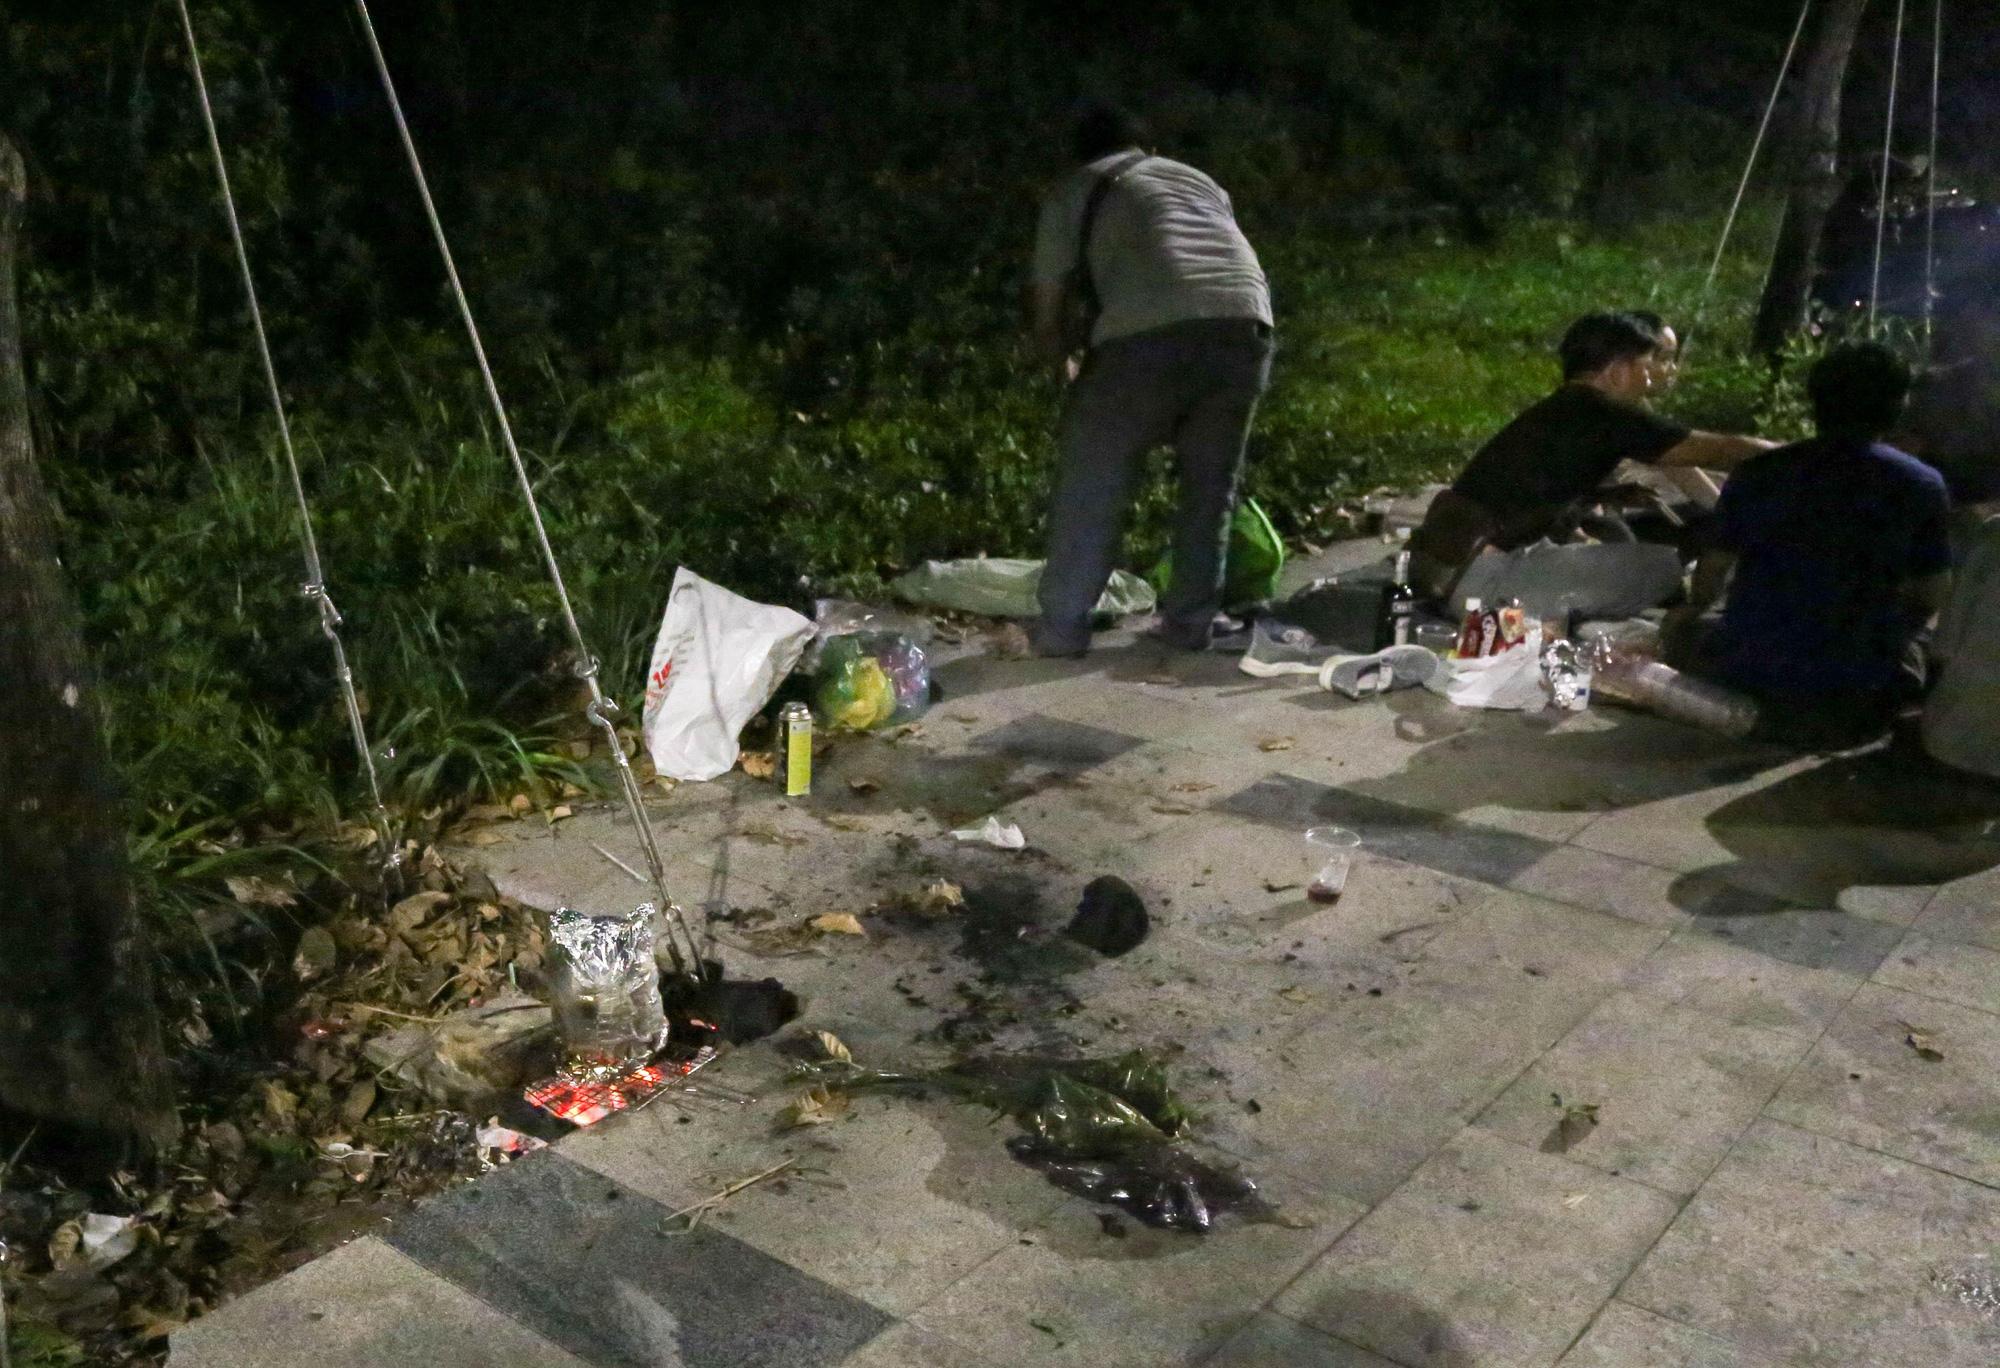 <em>Trash and charcoal create a messy scene on the promenade.</em> <em>Photo:</em> Thao Le / Tuoi Tre